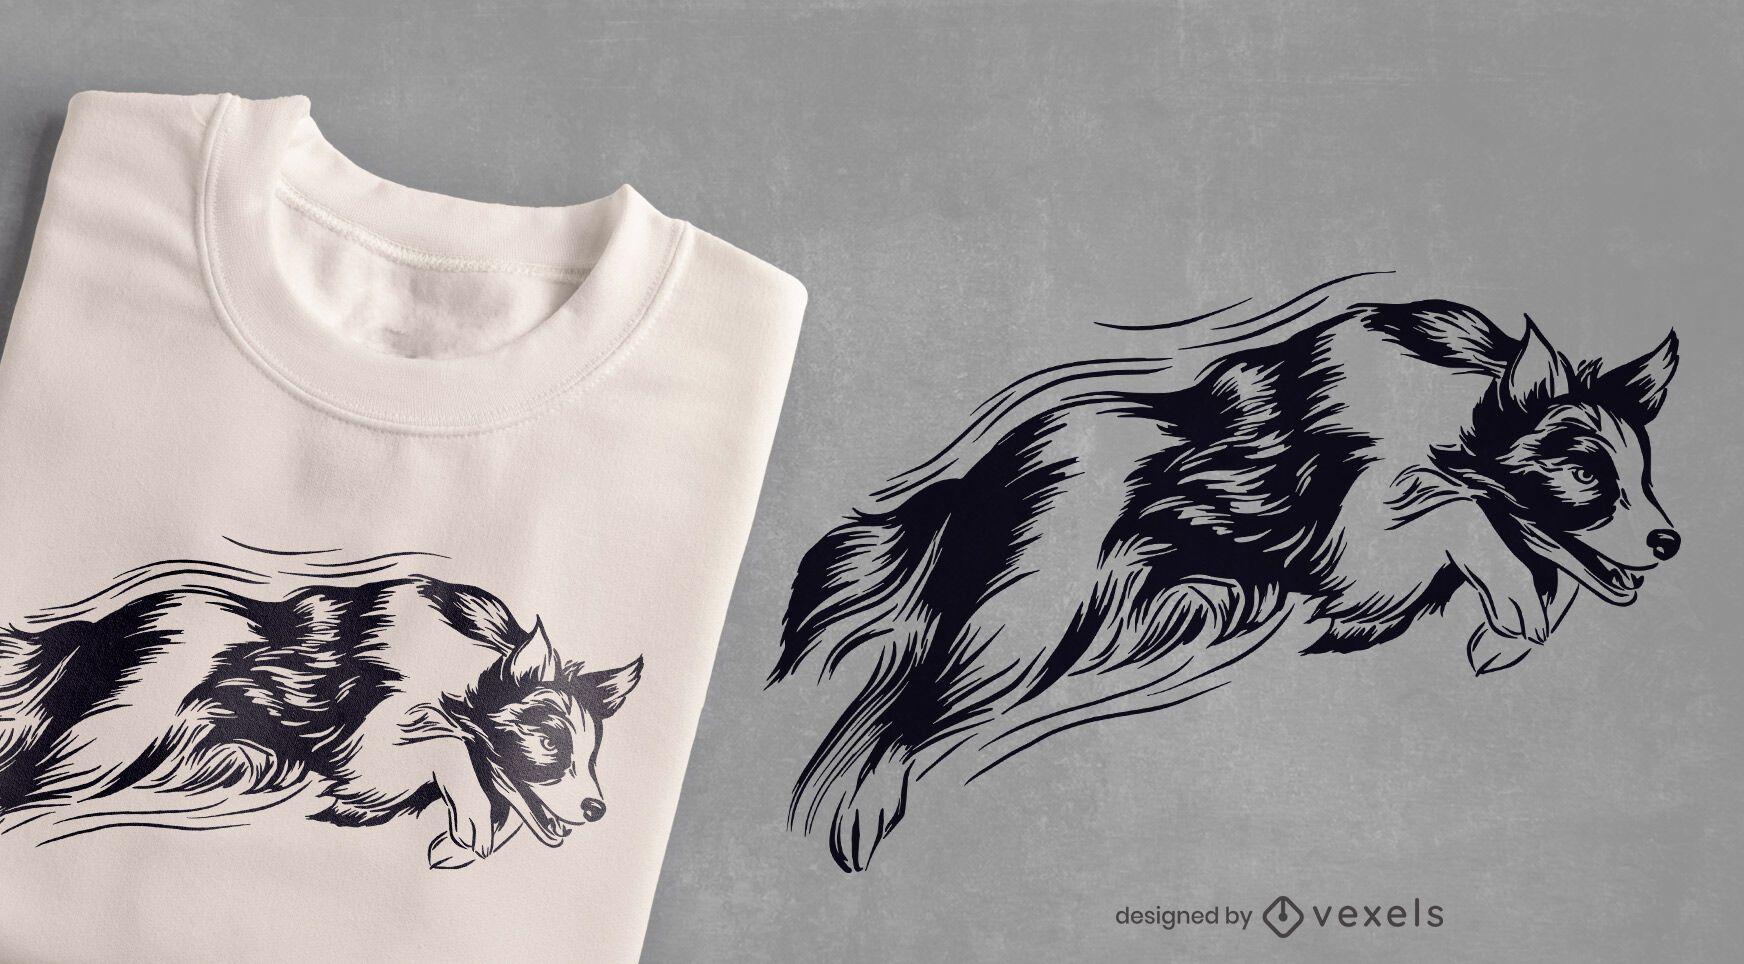 Jumping dog t-shirt design